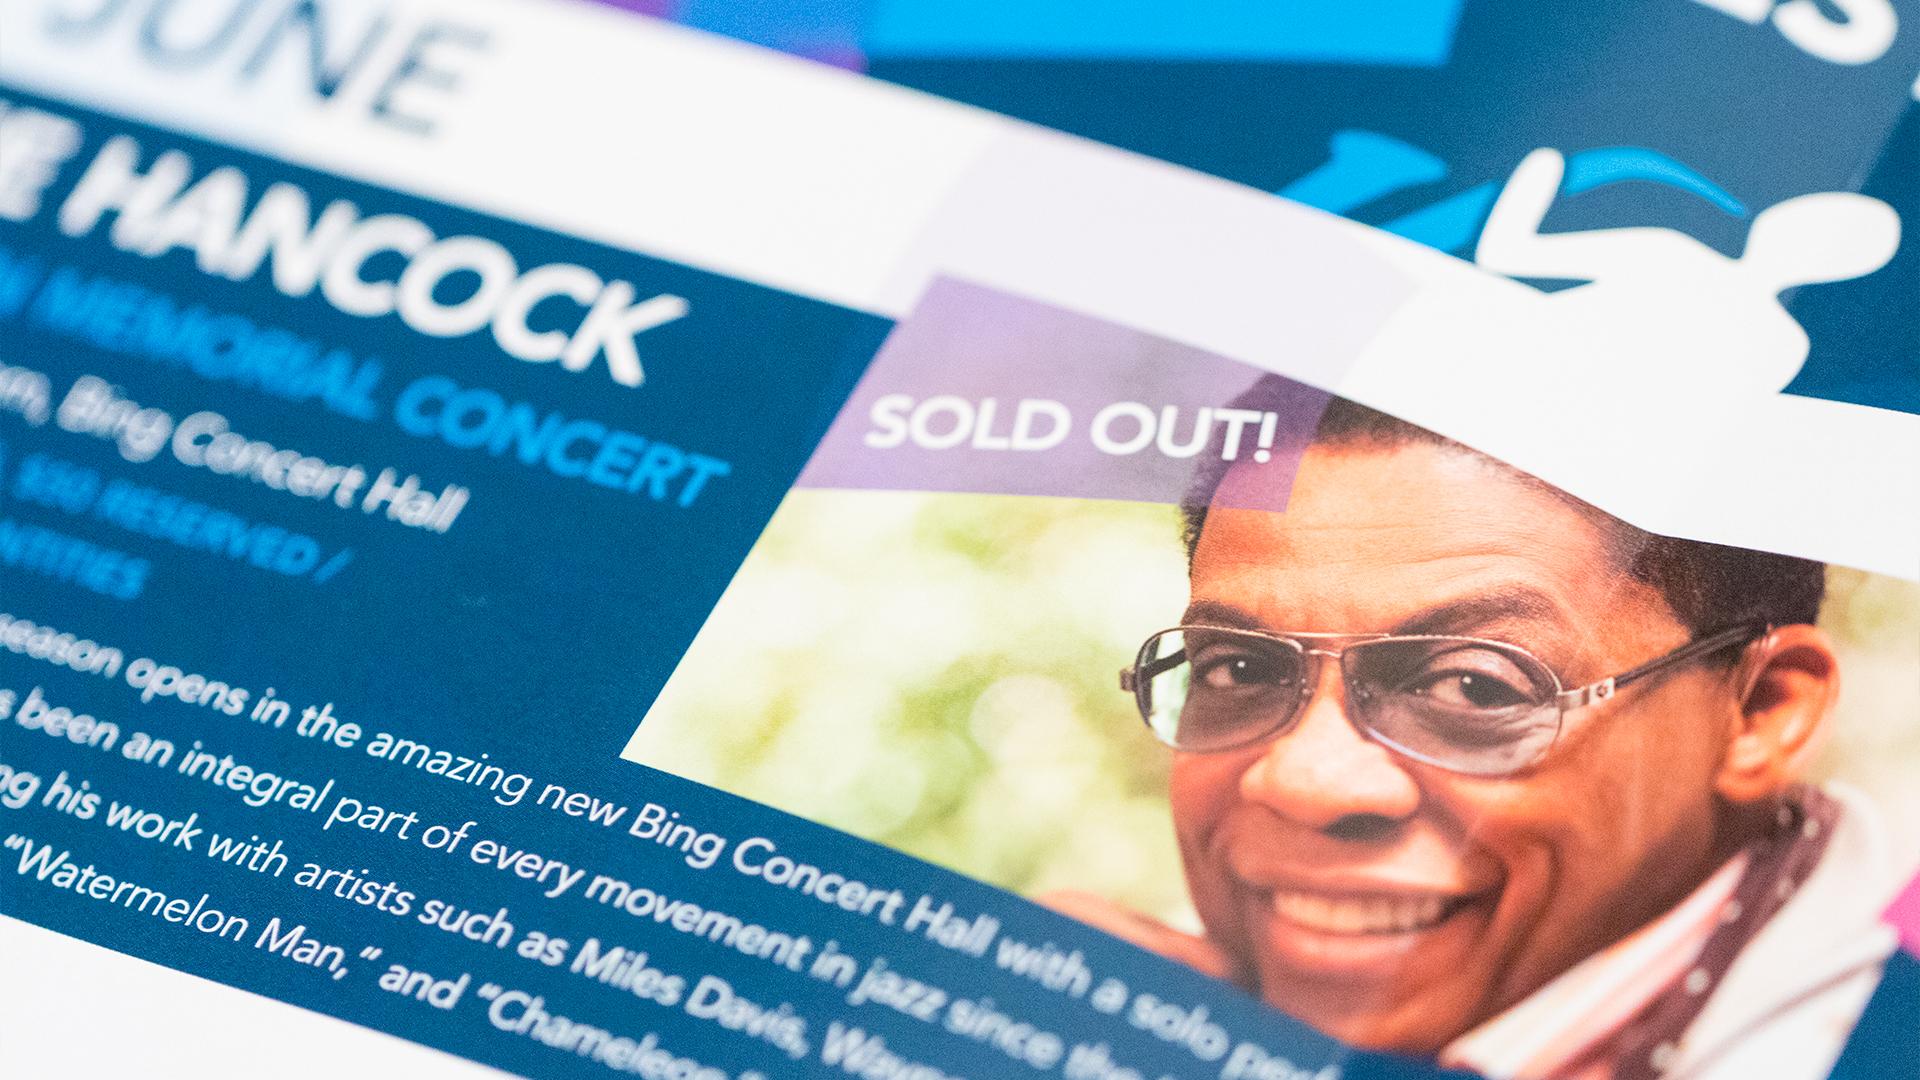 Print – Festival Mailer – Poster Side (Herbie Hancock Close-Up)